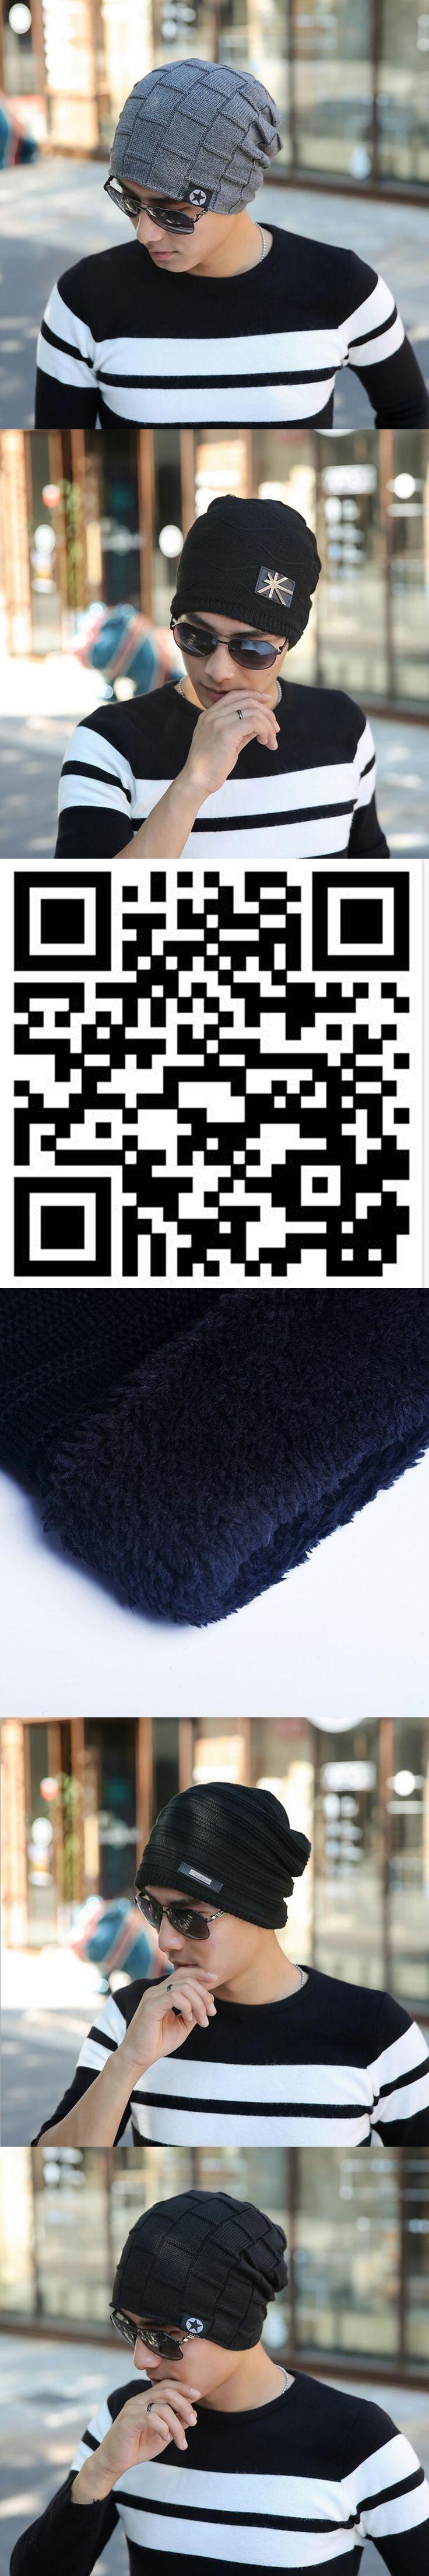 2016 Brand Beanies Knit Winter Hats For Men Women Beanie Men's Winter Hat Caps Bonnet Outdoor Ski Sports Warm Baggy Cap gorros